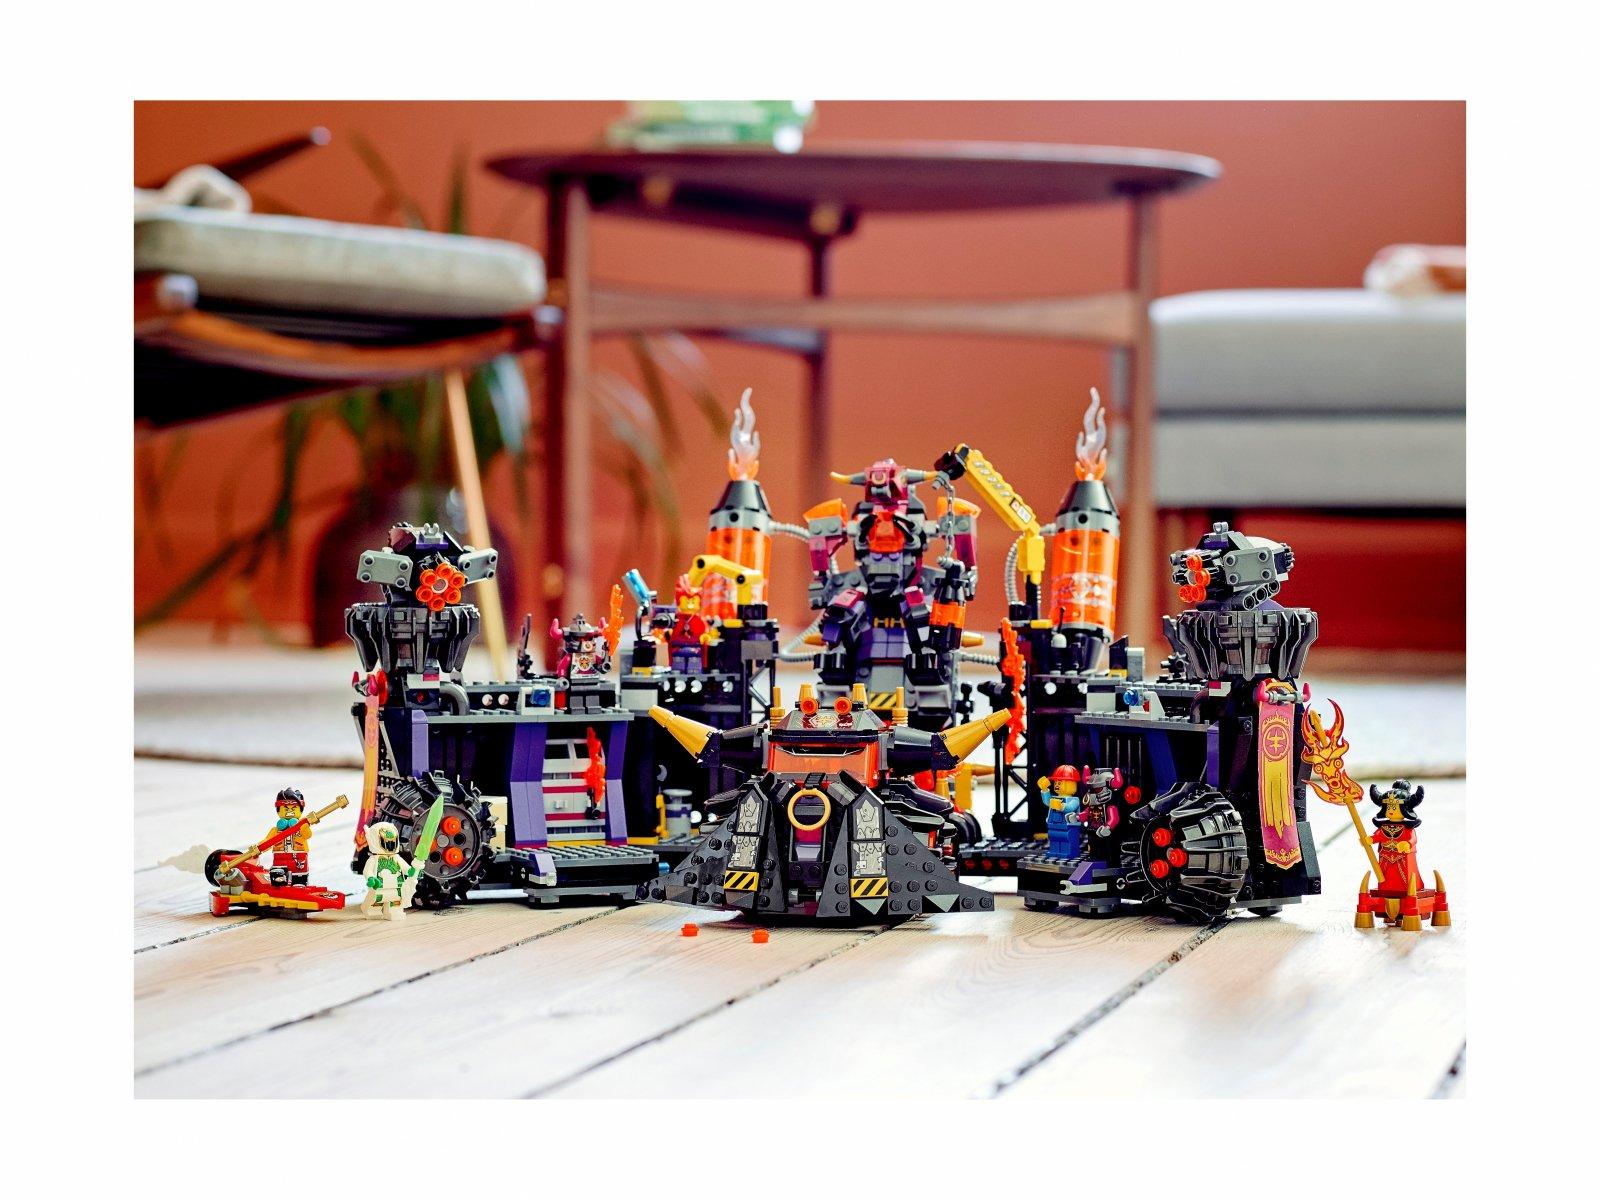 LEGO Monkie Kid 80016 Ognista huta